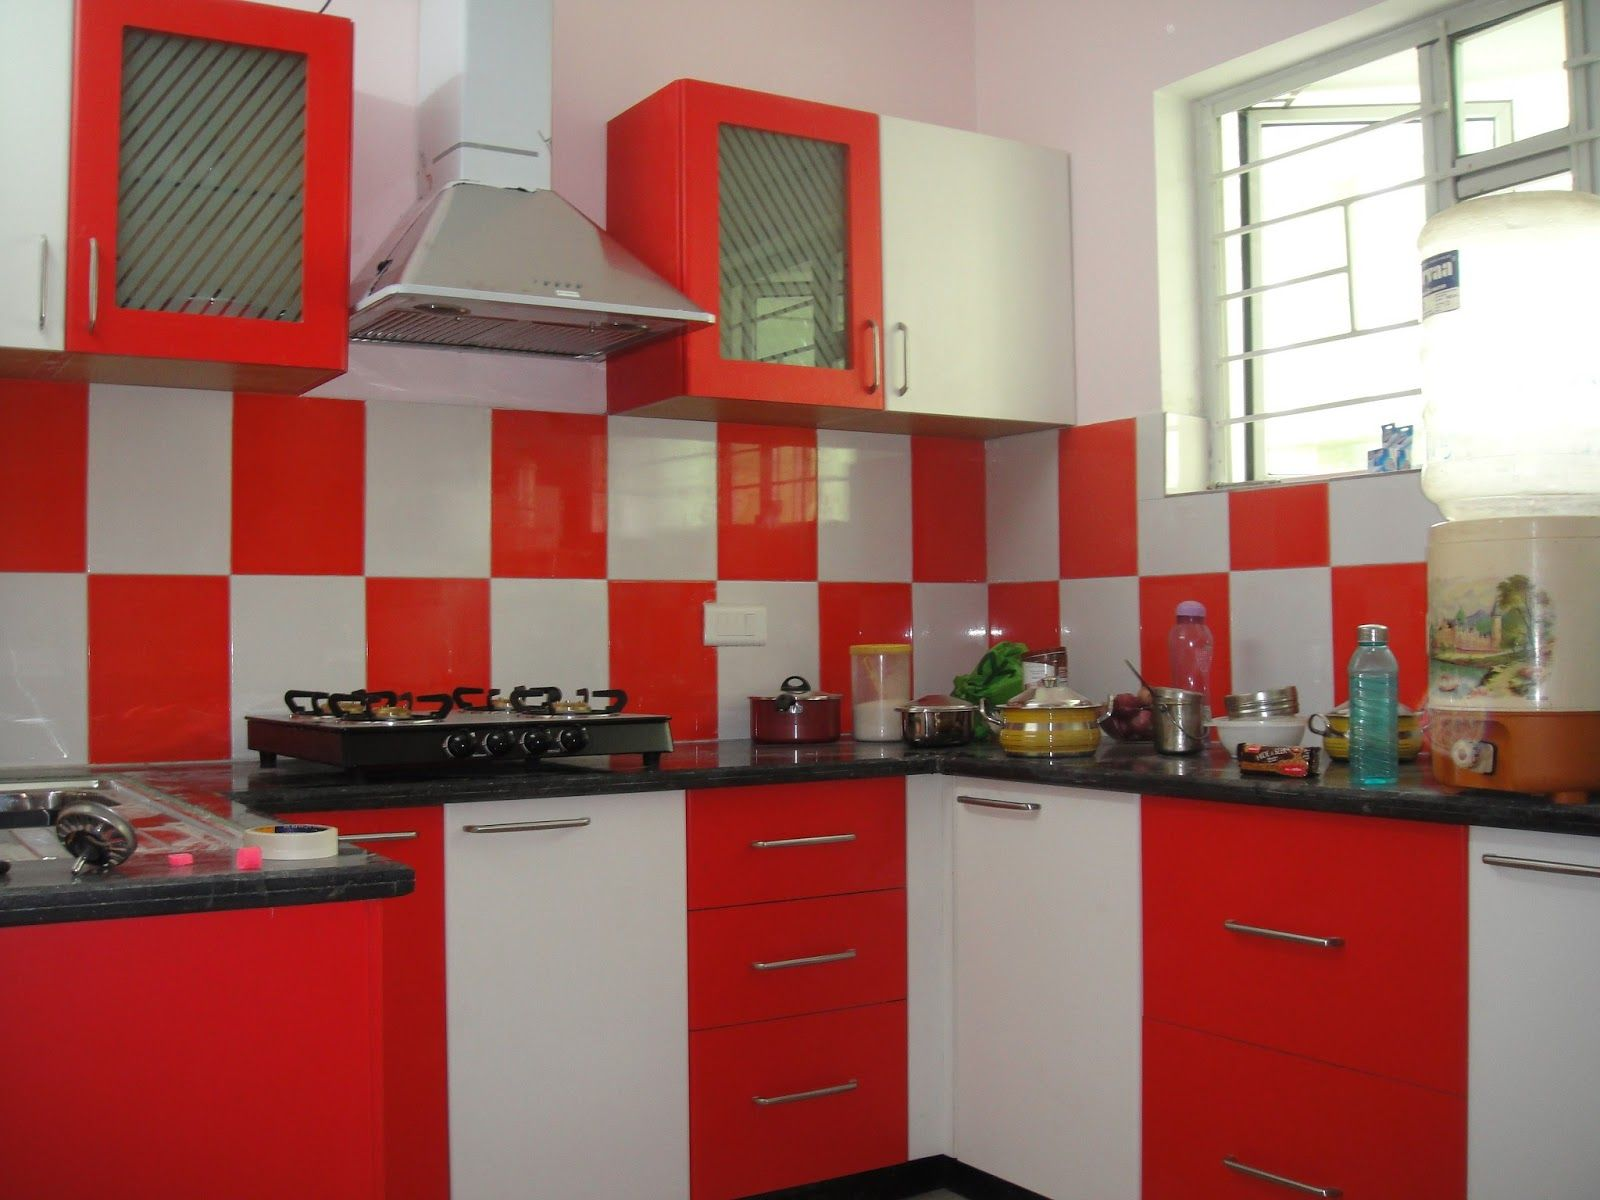 Kitchen Cool Modern Wall Tiles For Kitchen Backsplash Designs Excellent Red And White Kitchen Decorating Th Black Kitchen Decor Red Kitchen Decor Red Kitchen